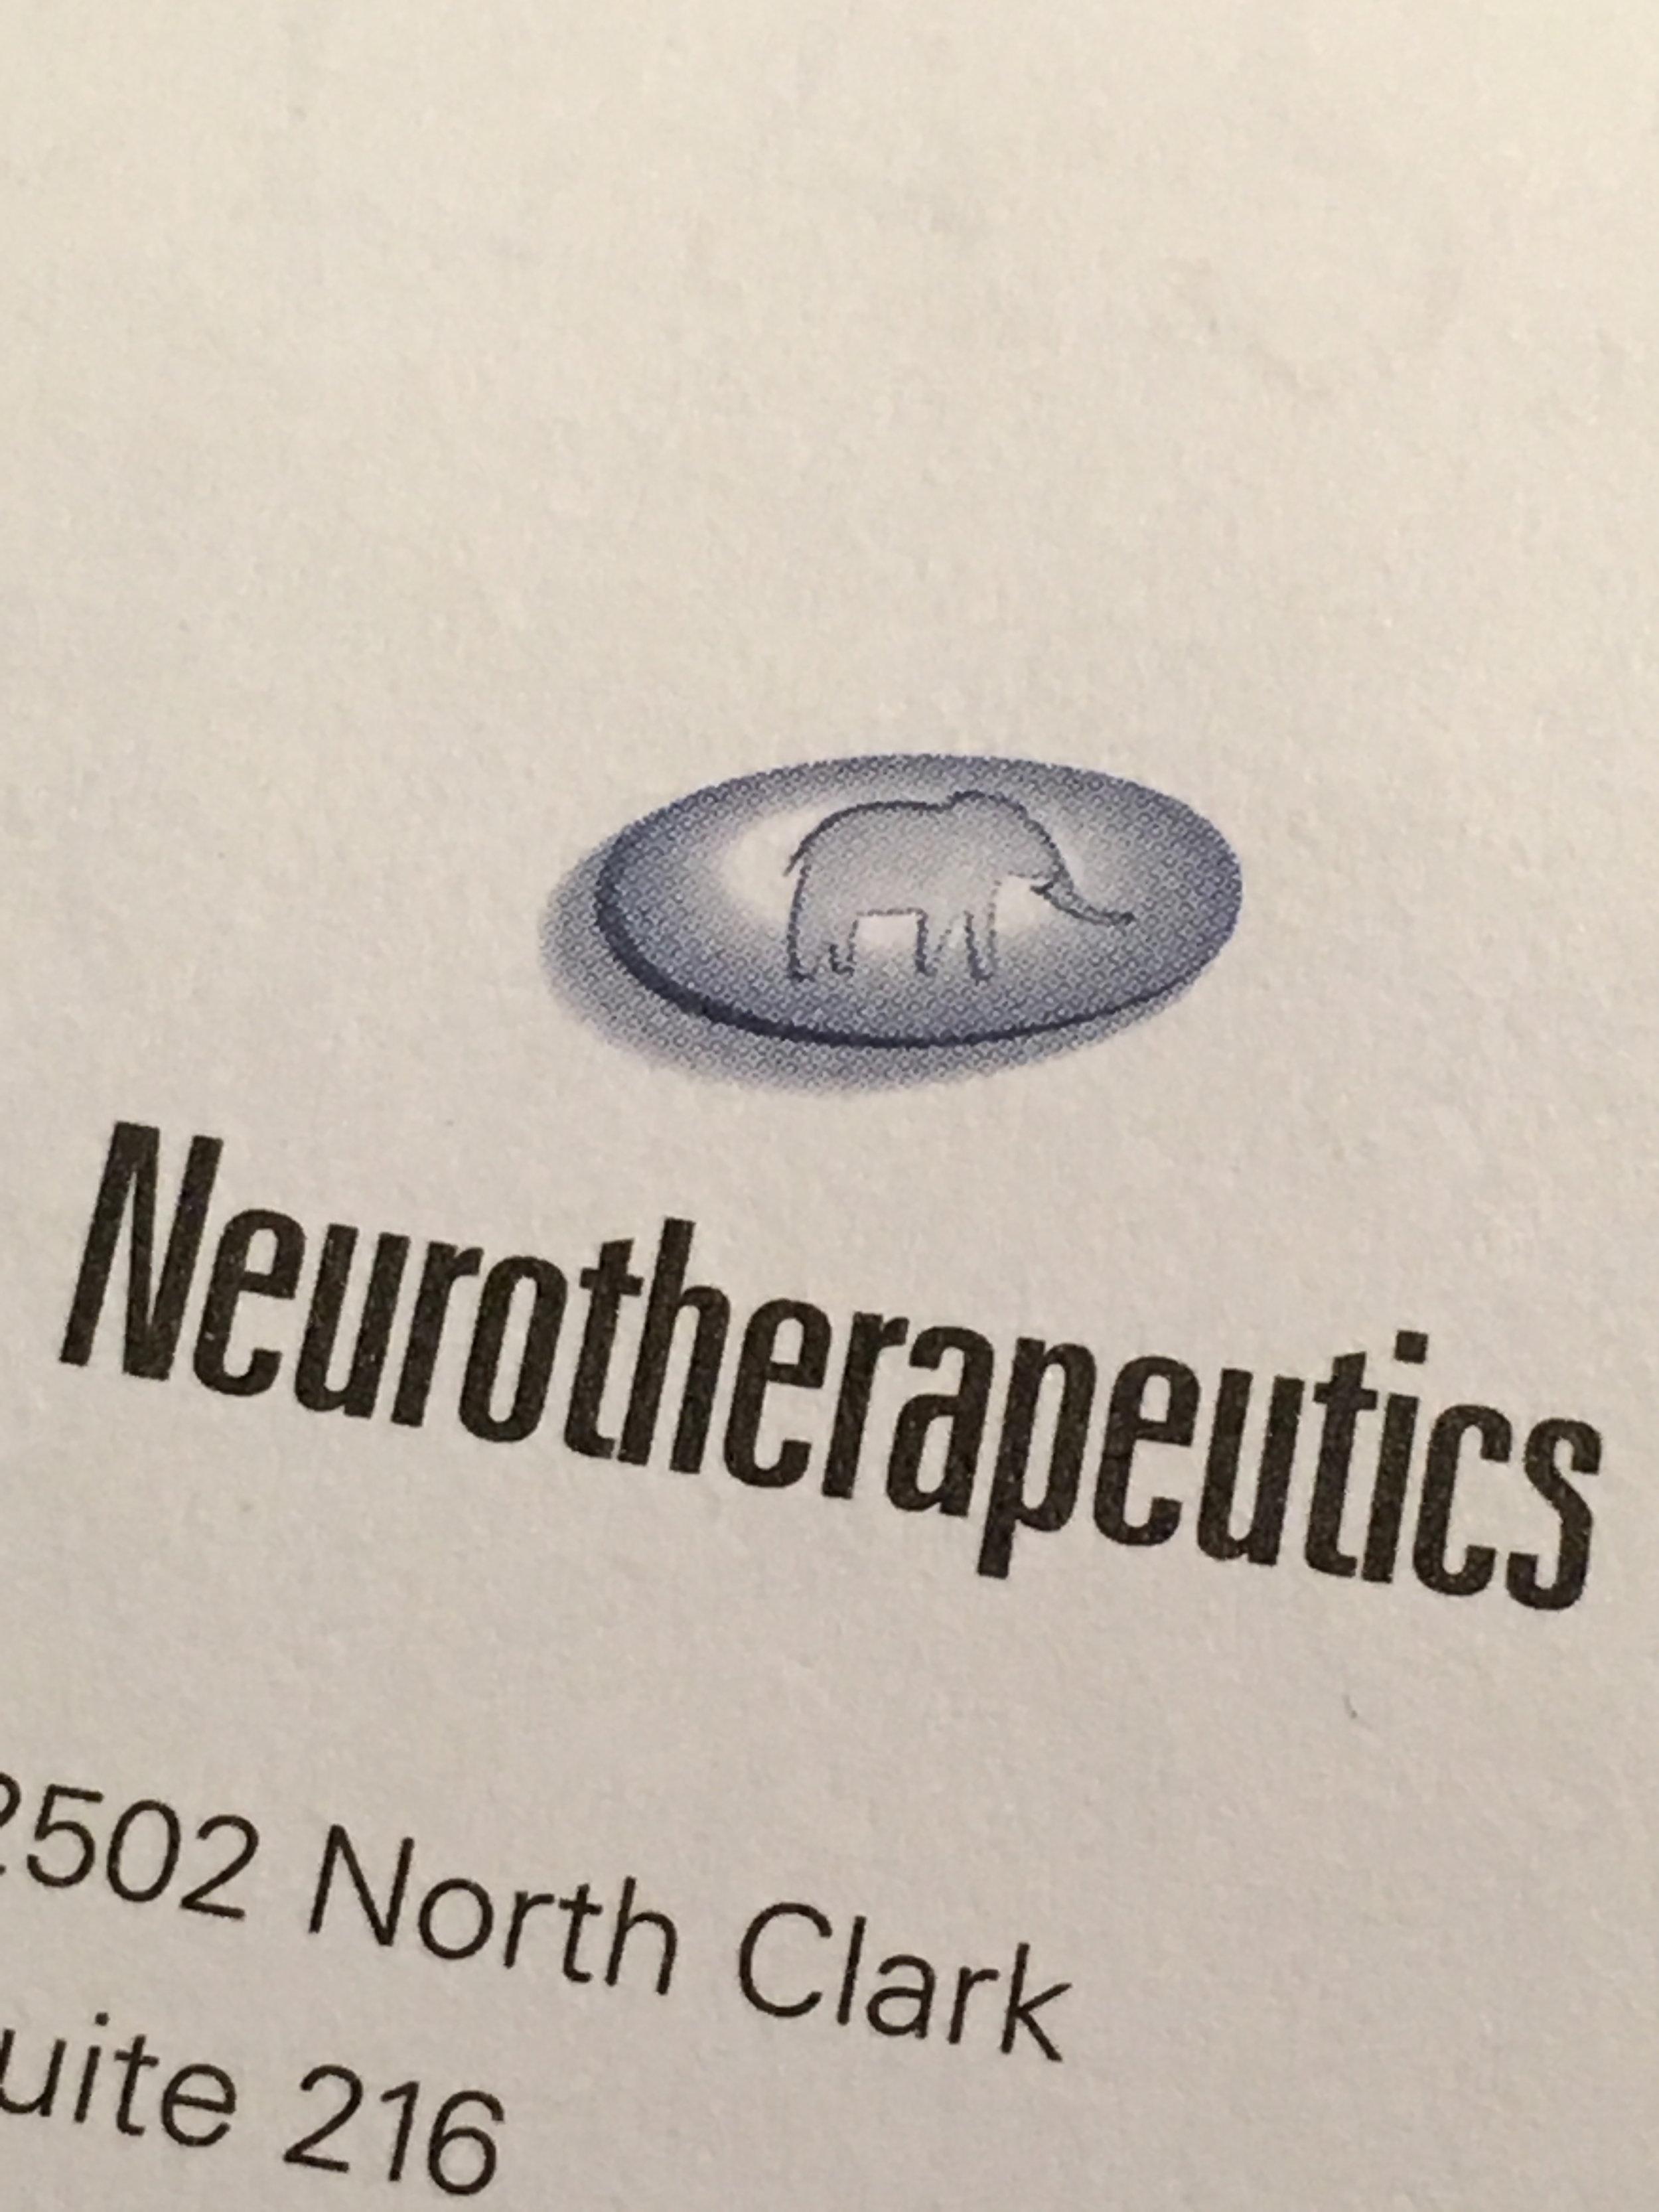 neurotherapeutics logo.jpg